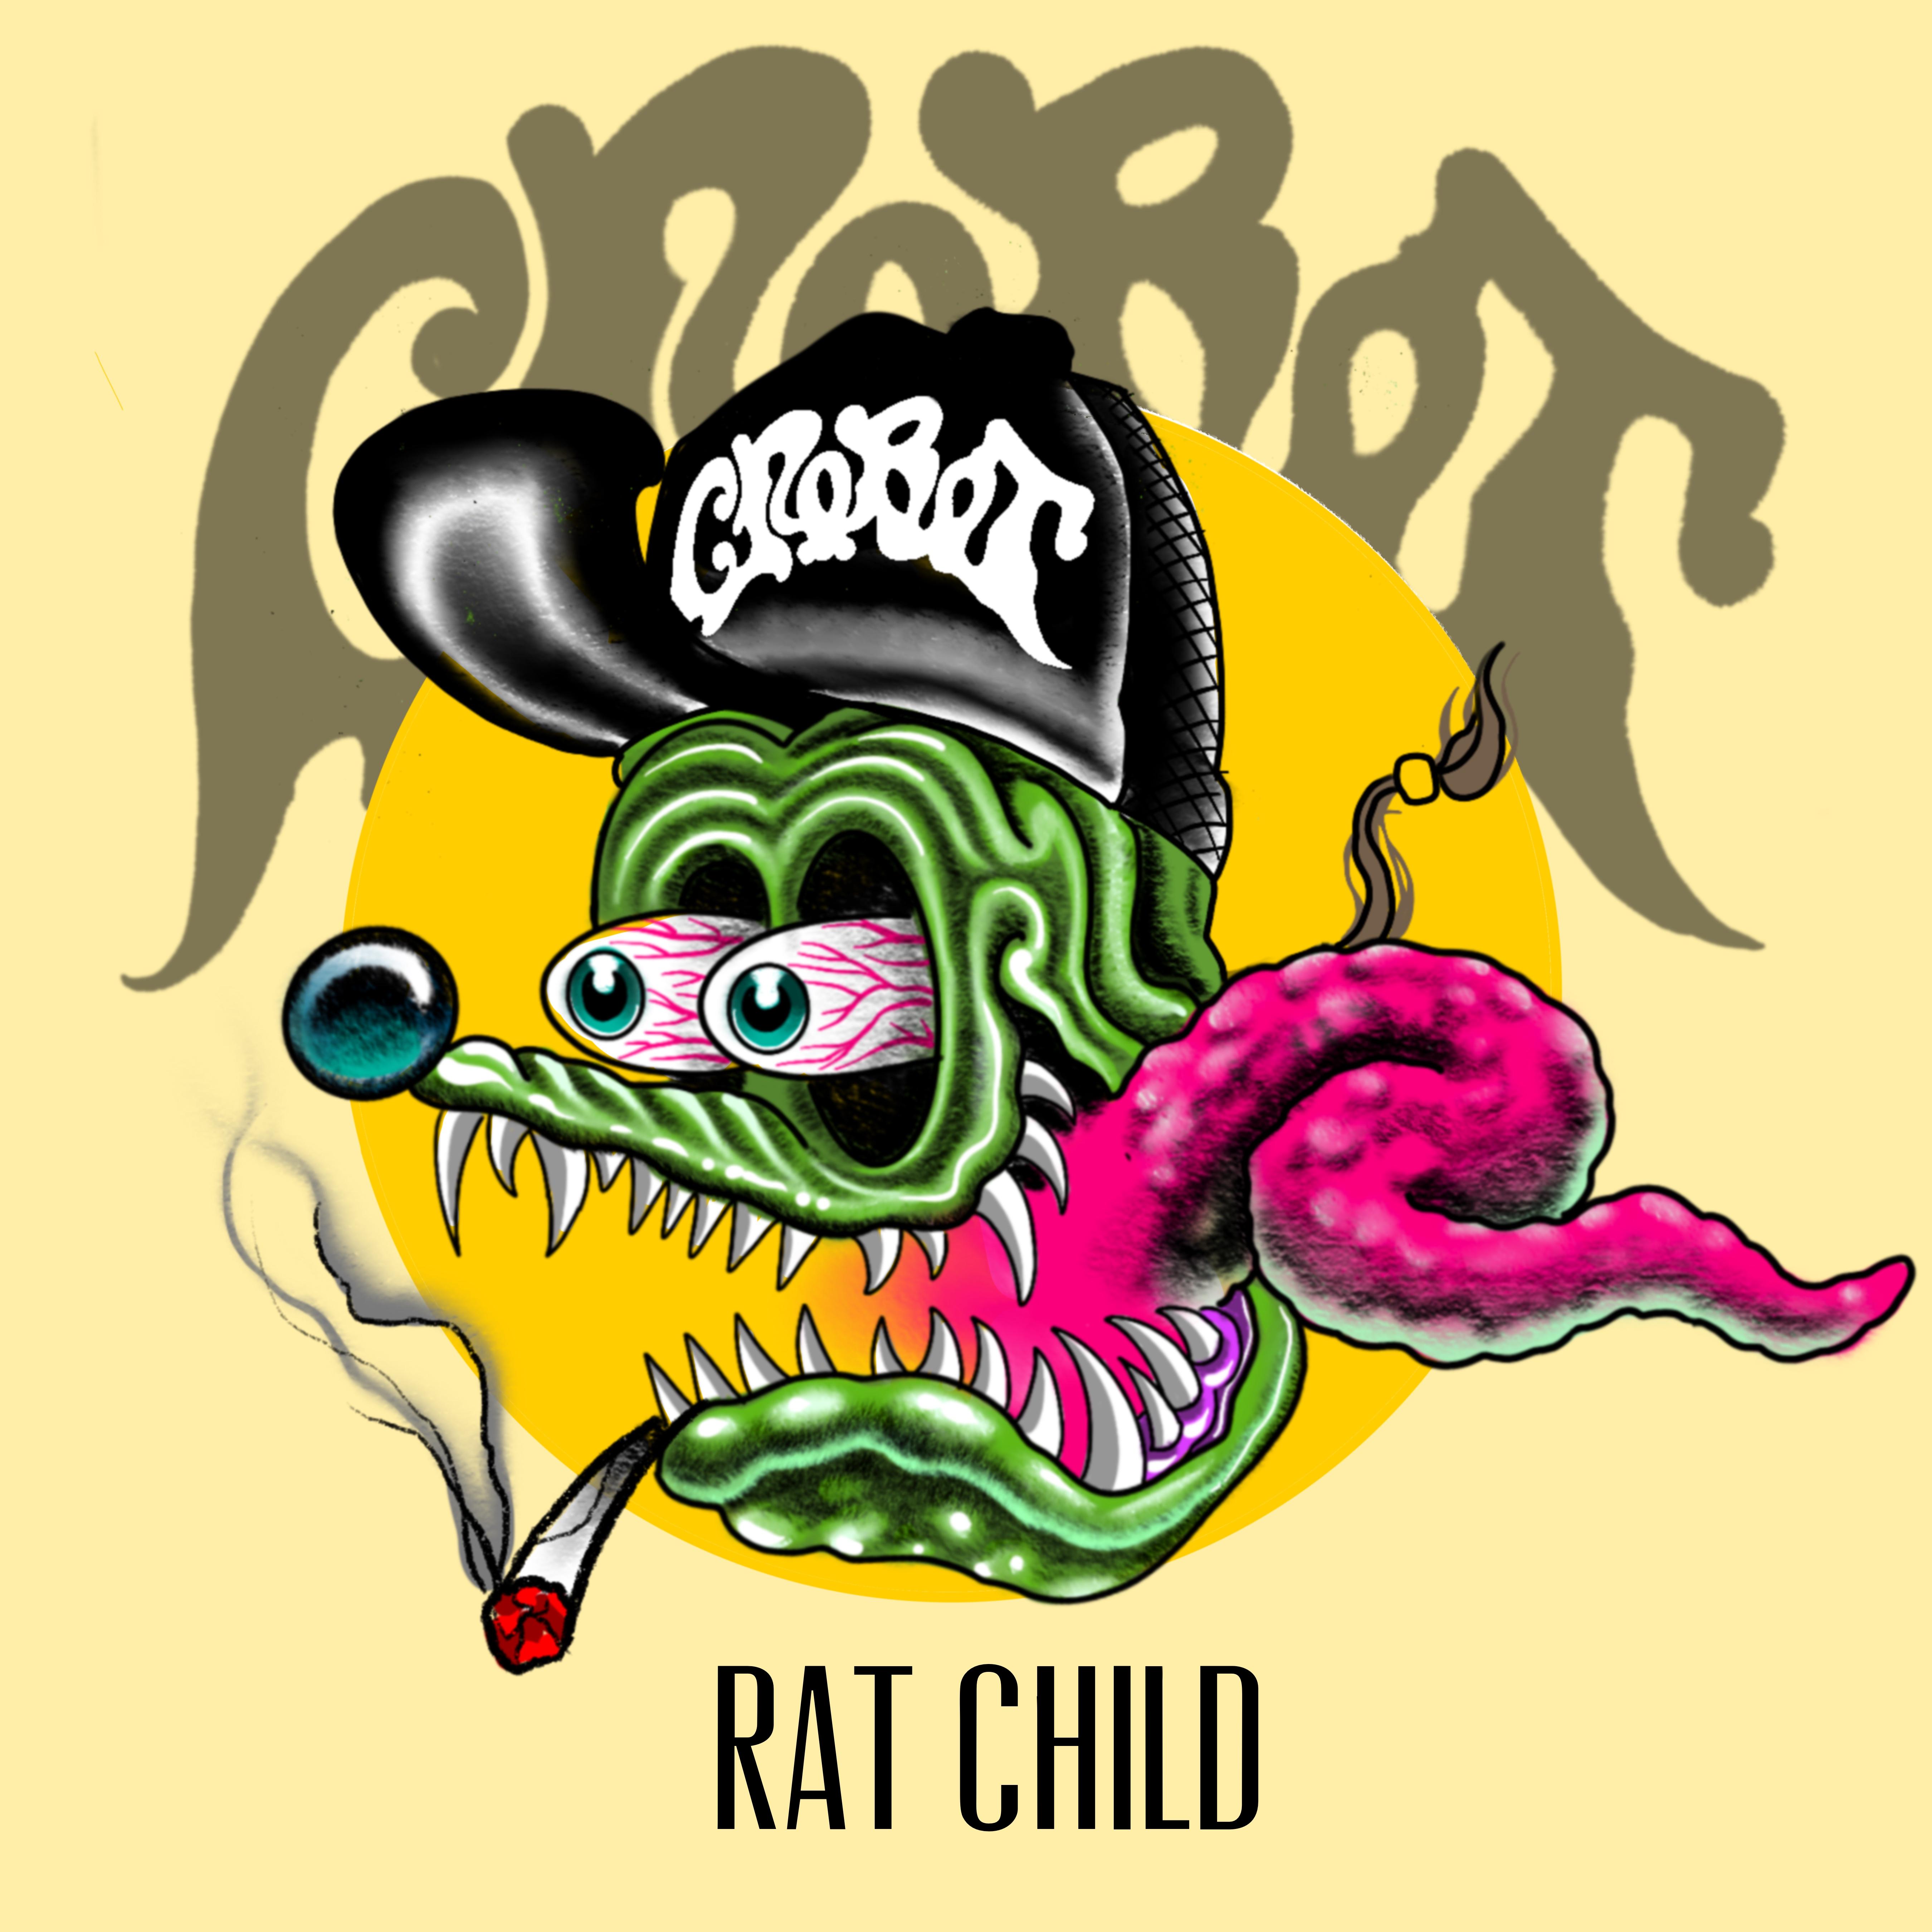 rat_child_art.jpg